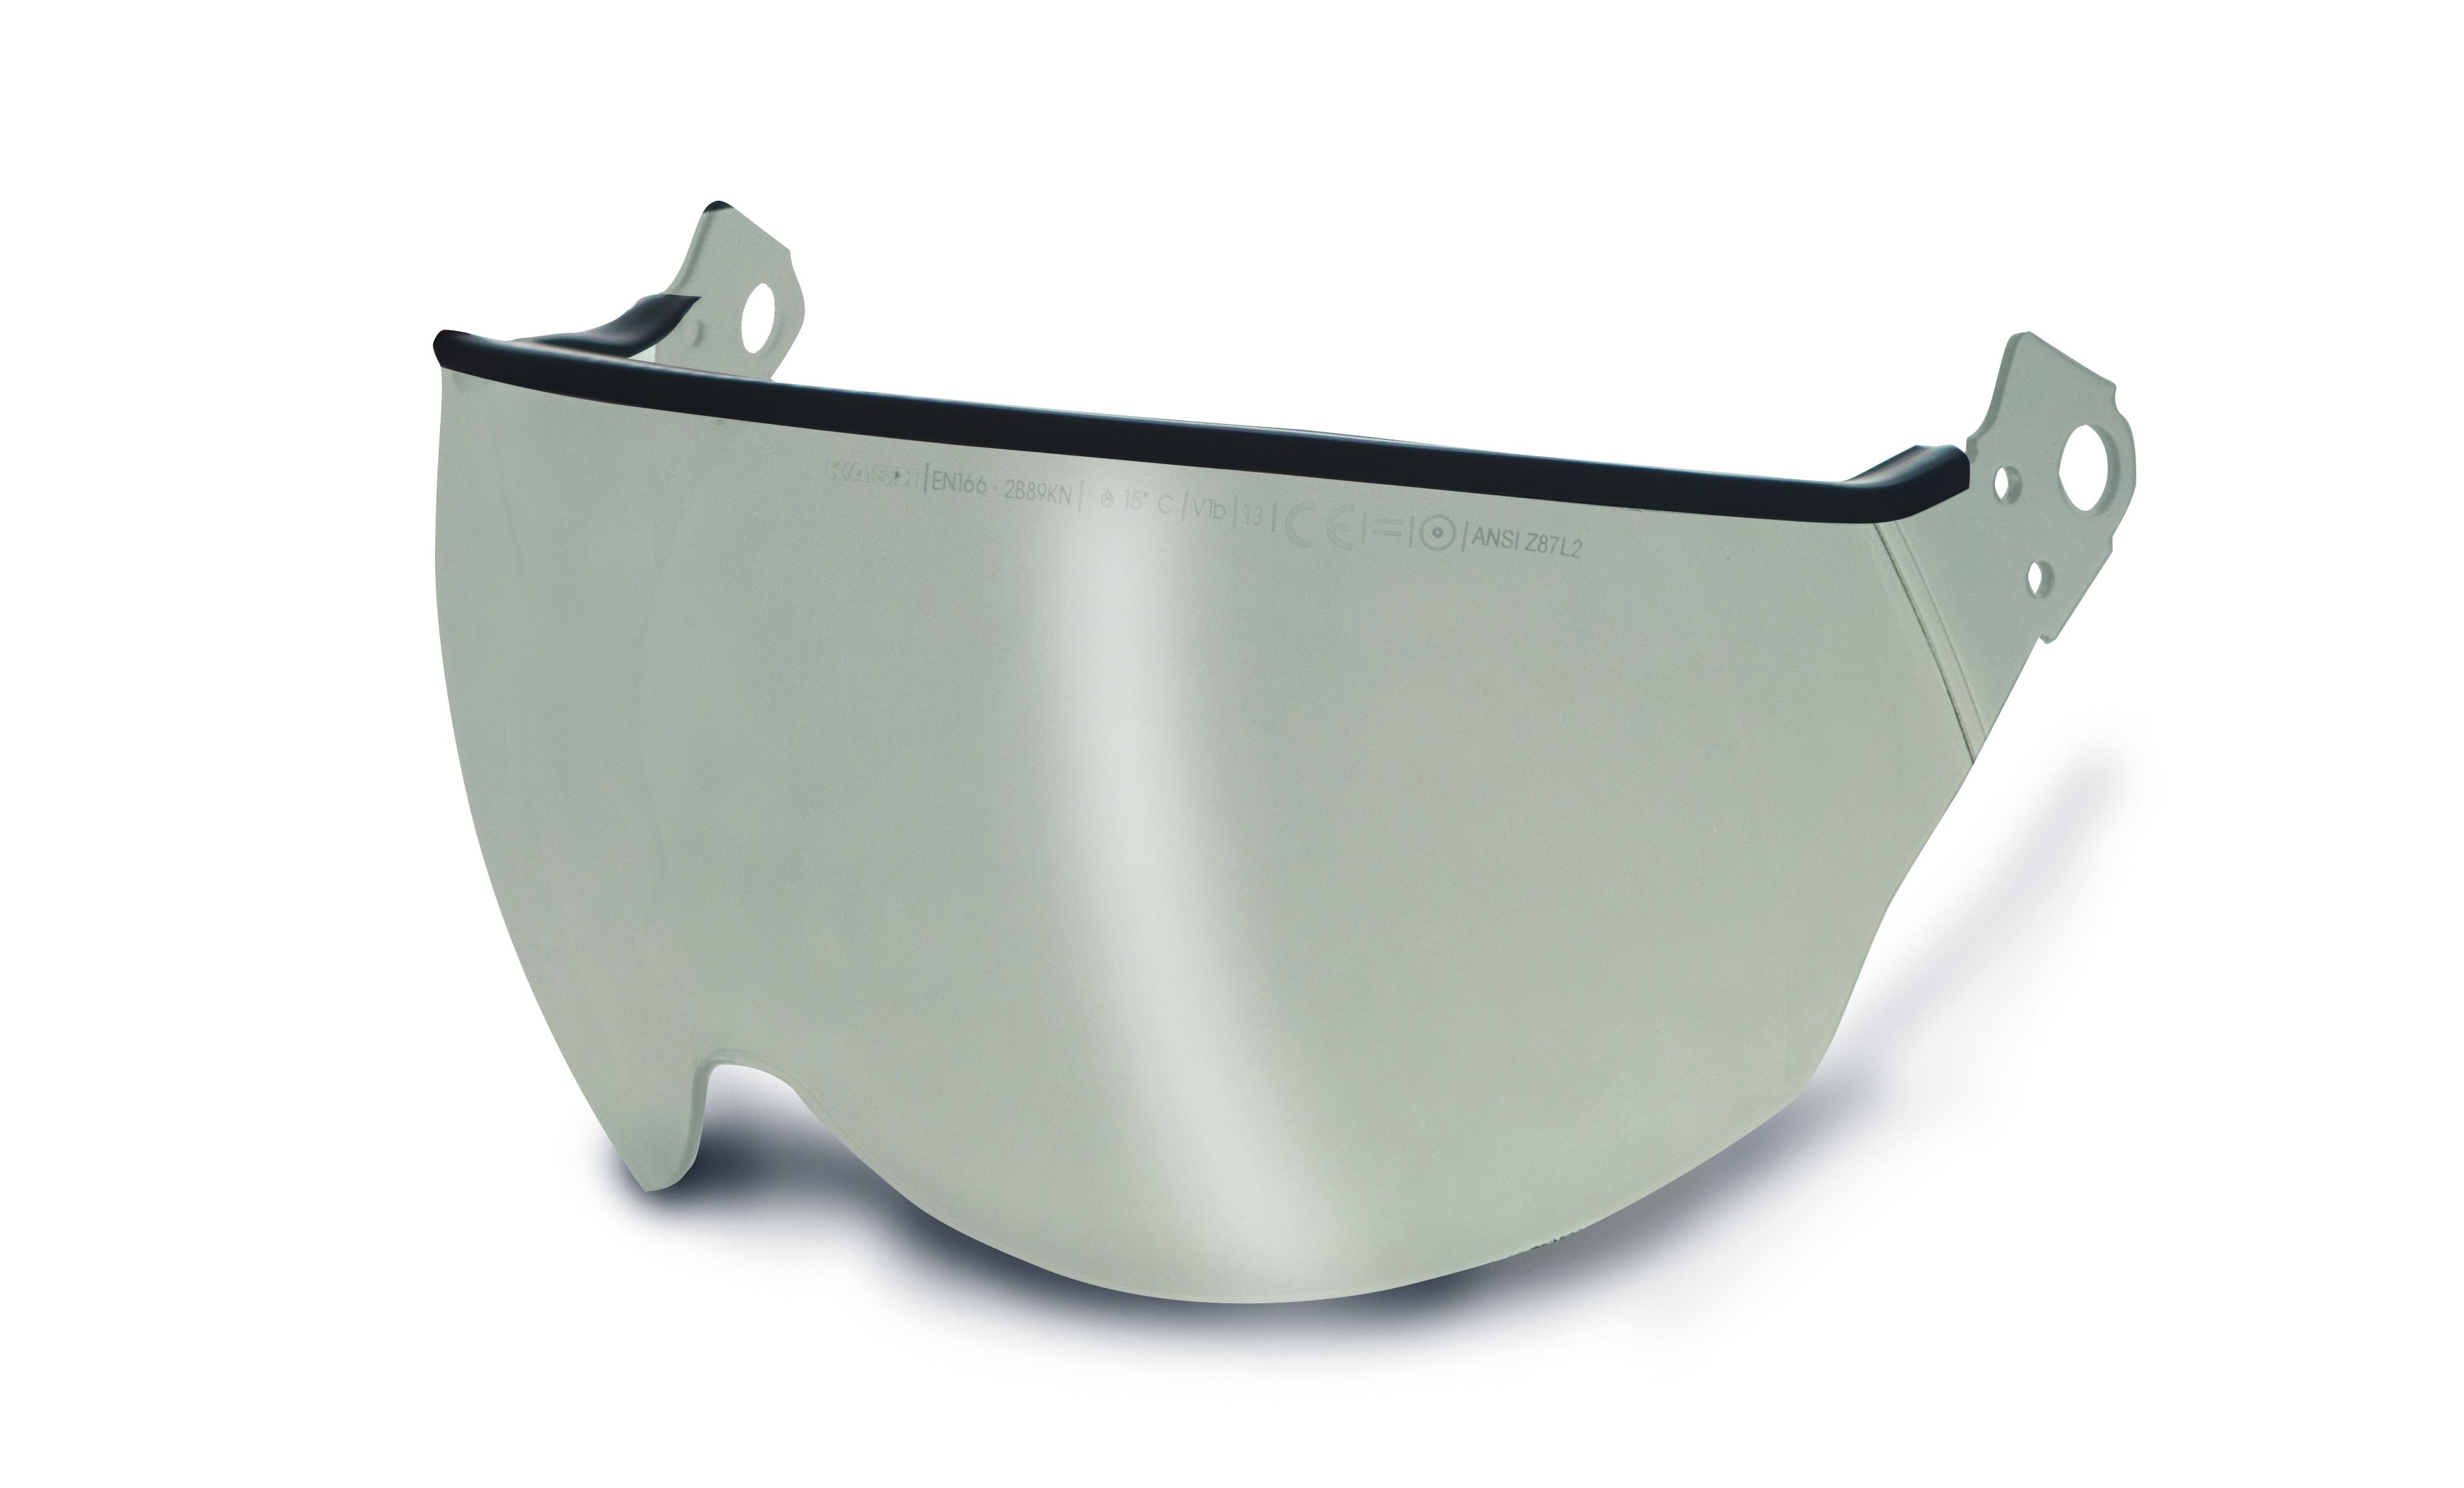 Kask Polycarbonate Visor — Silver Mirror KA-WVI00002.025